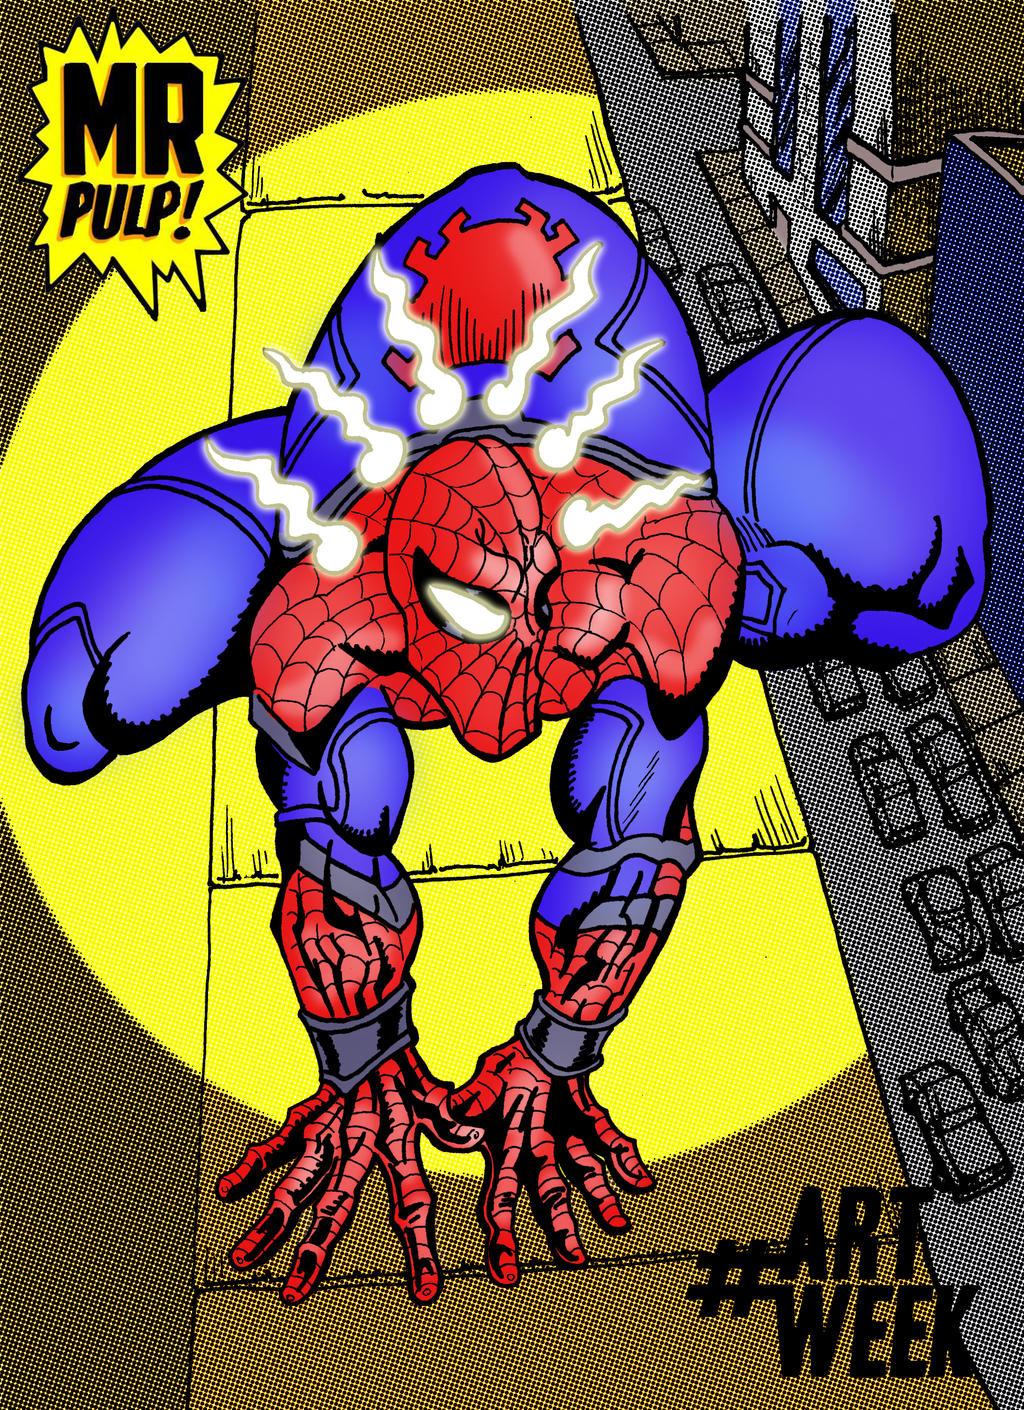 spider man hombre arana by mrpulp-presenta